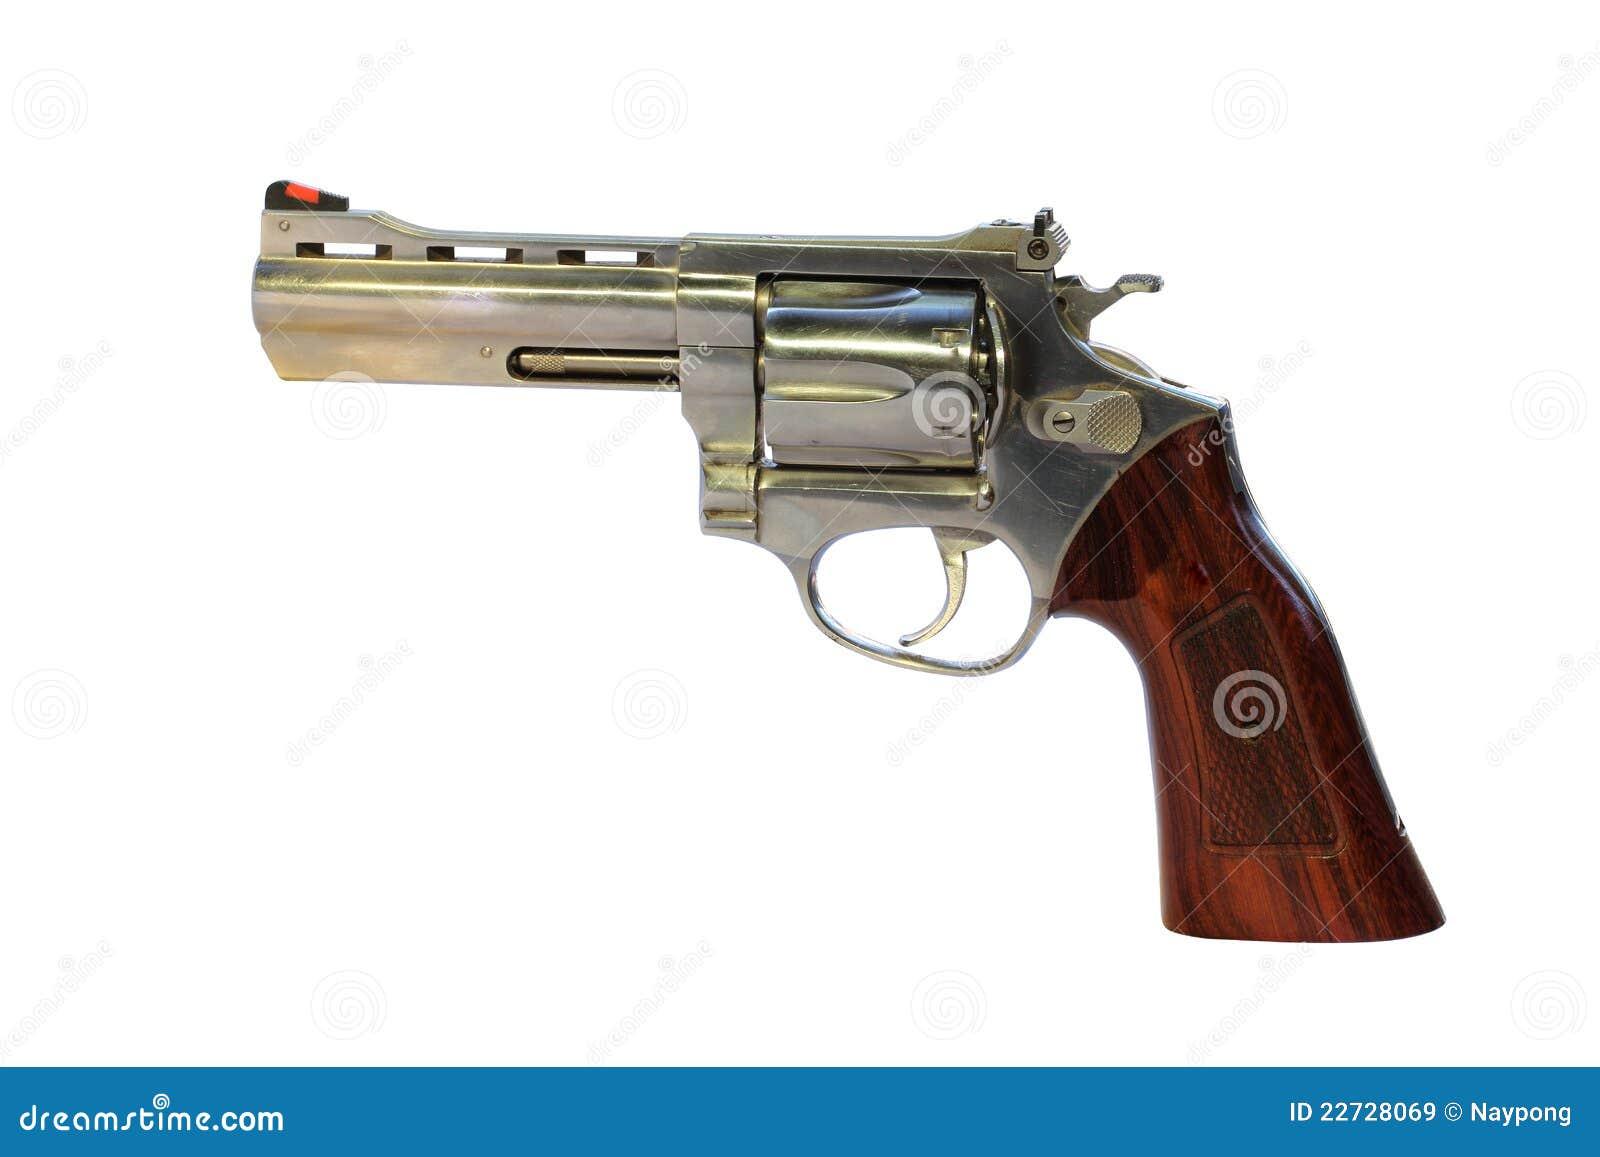 gun white background - photo #2